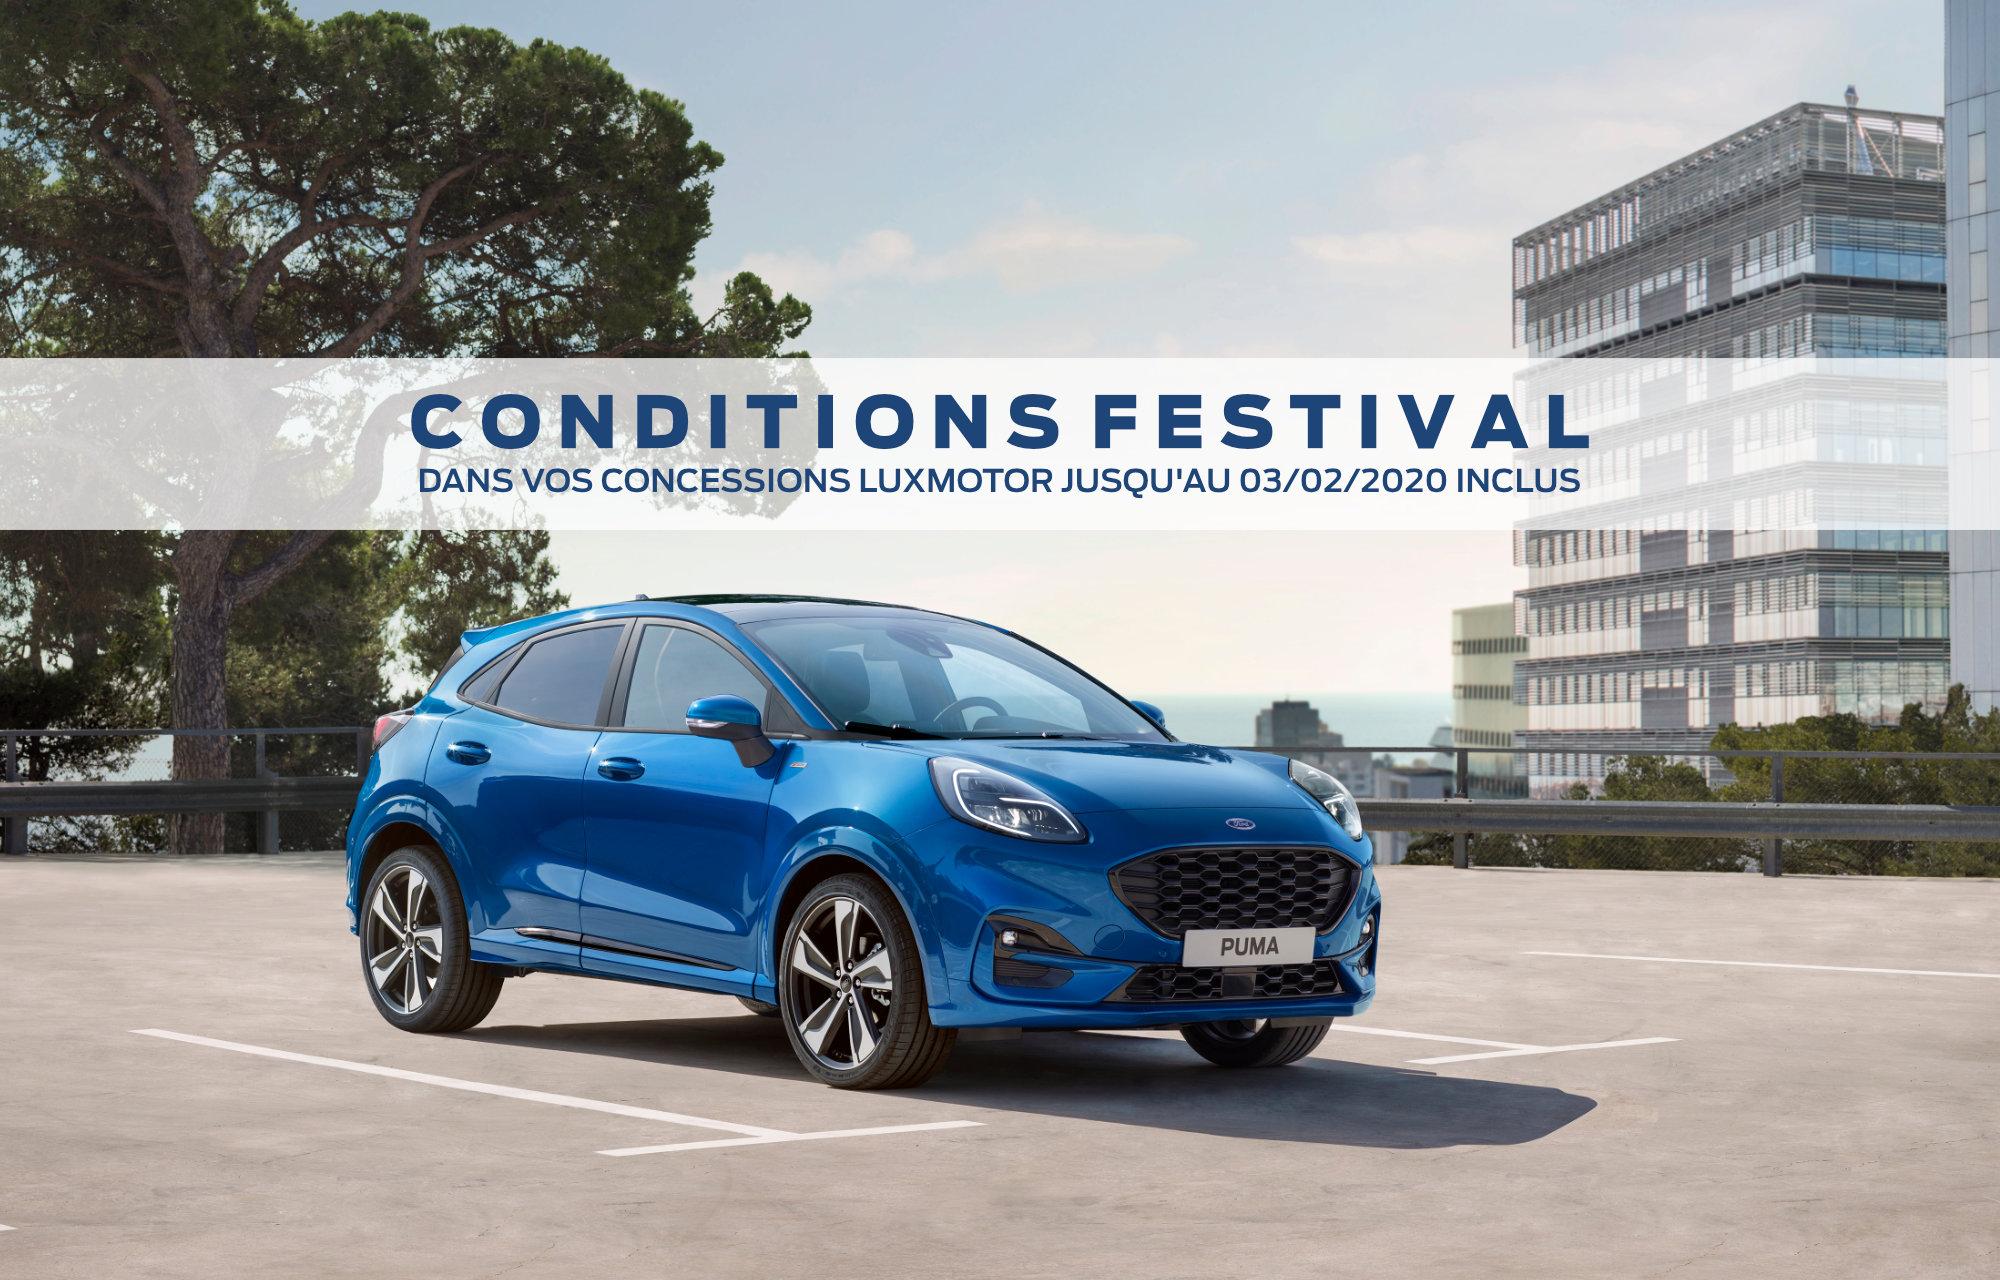 Conditions Festival LuxMotor